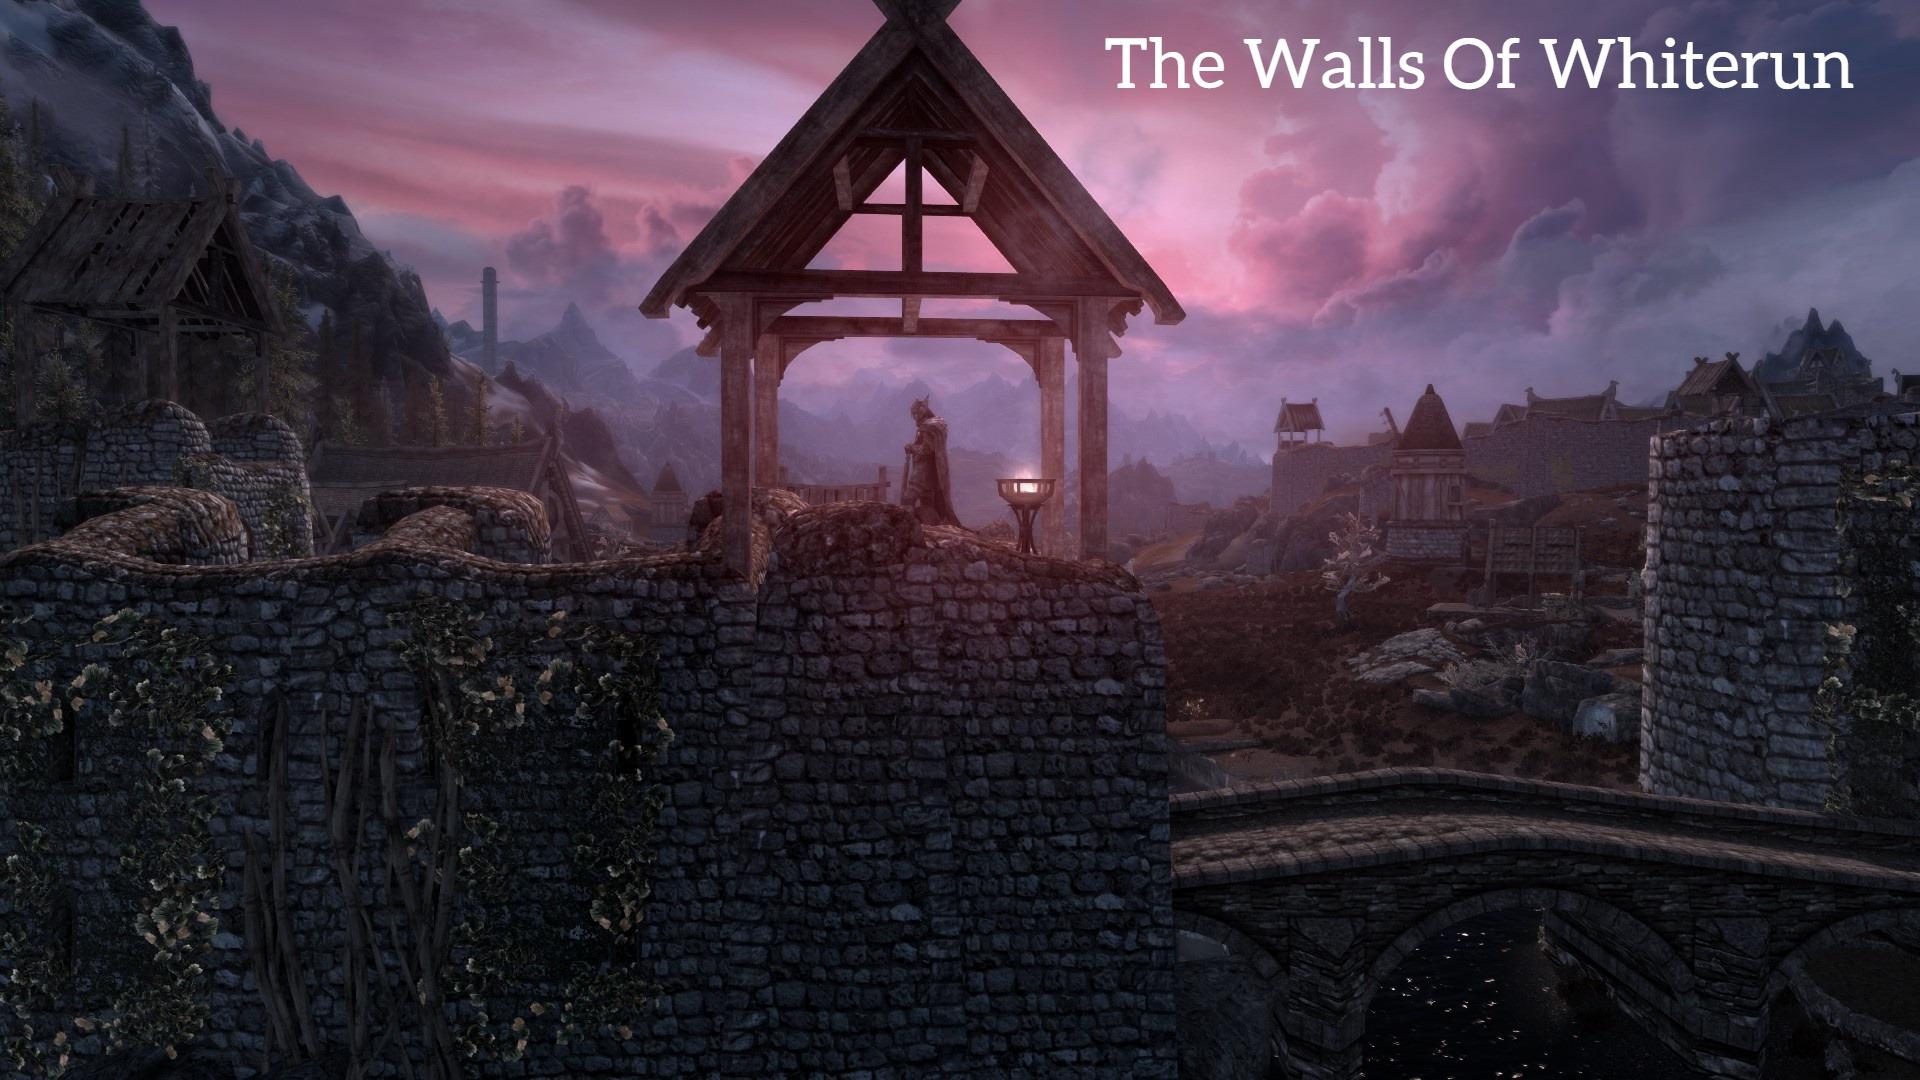 The Walls of Whiterun